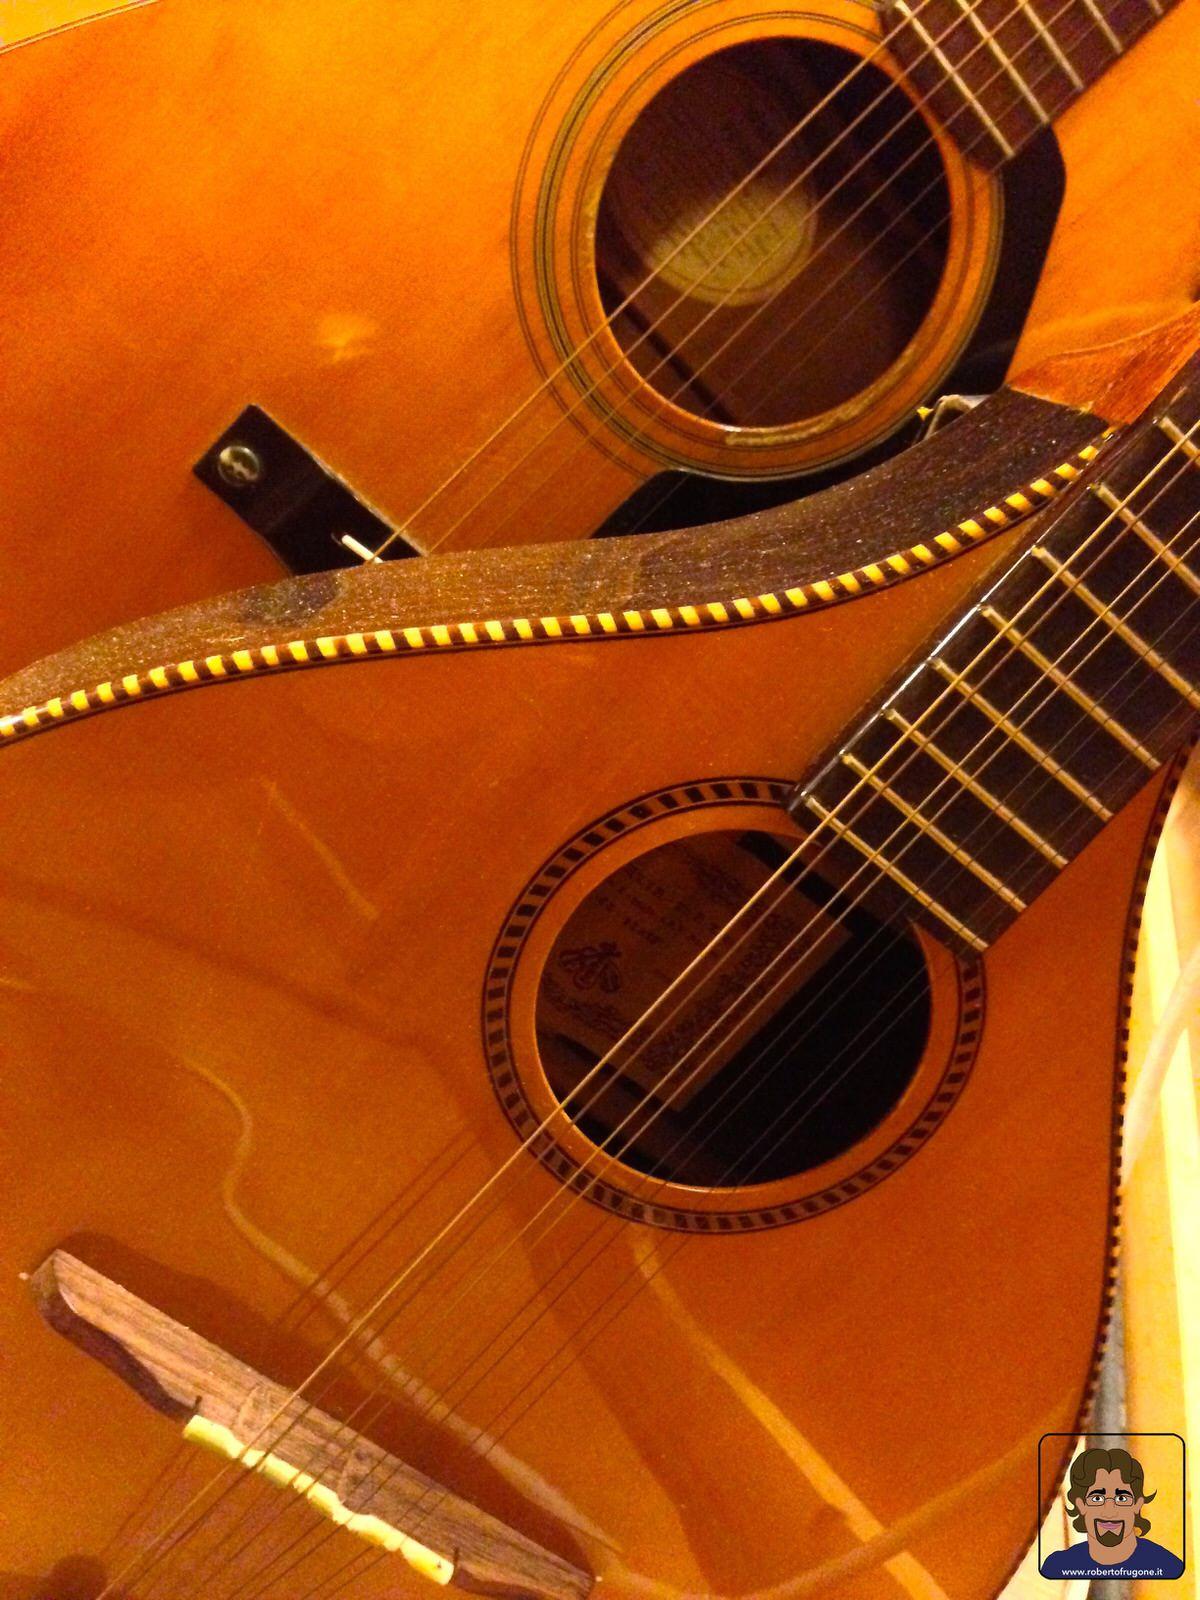 Totem Studio Sala Prove Musicali Casarza Ligure Taylor e boukouki